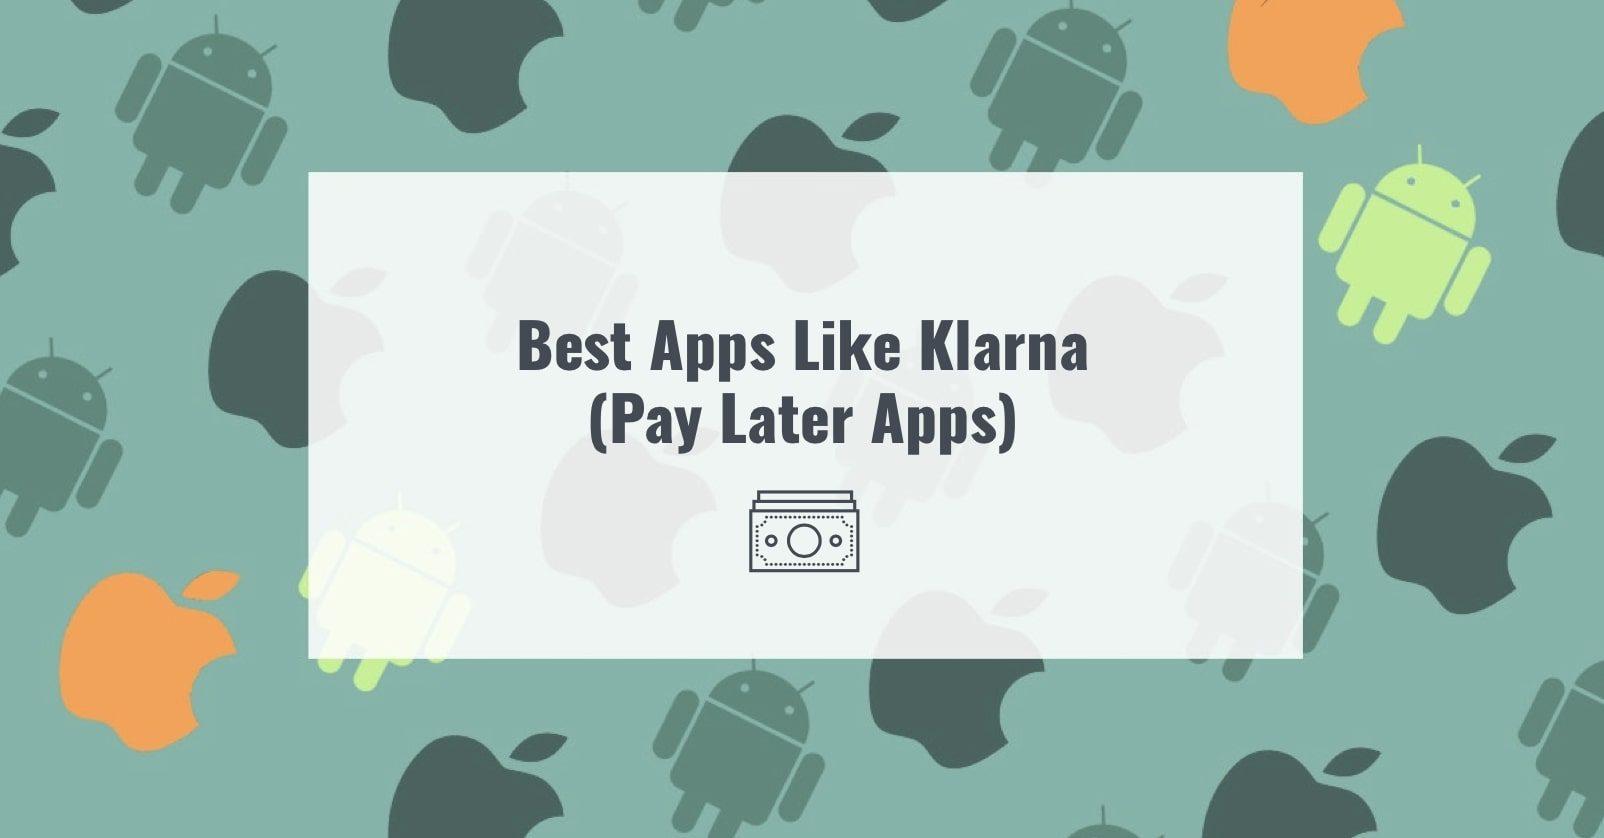 Best Apps Like Klarna (Pay Later Apps)